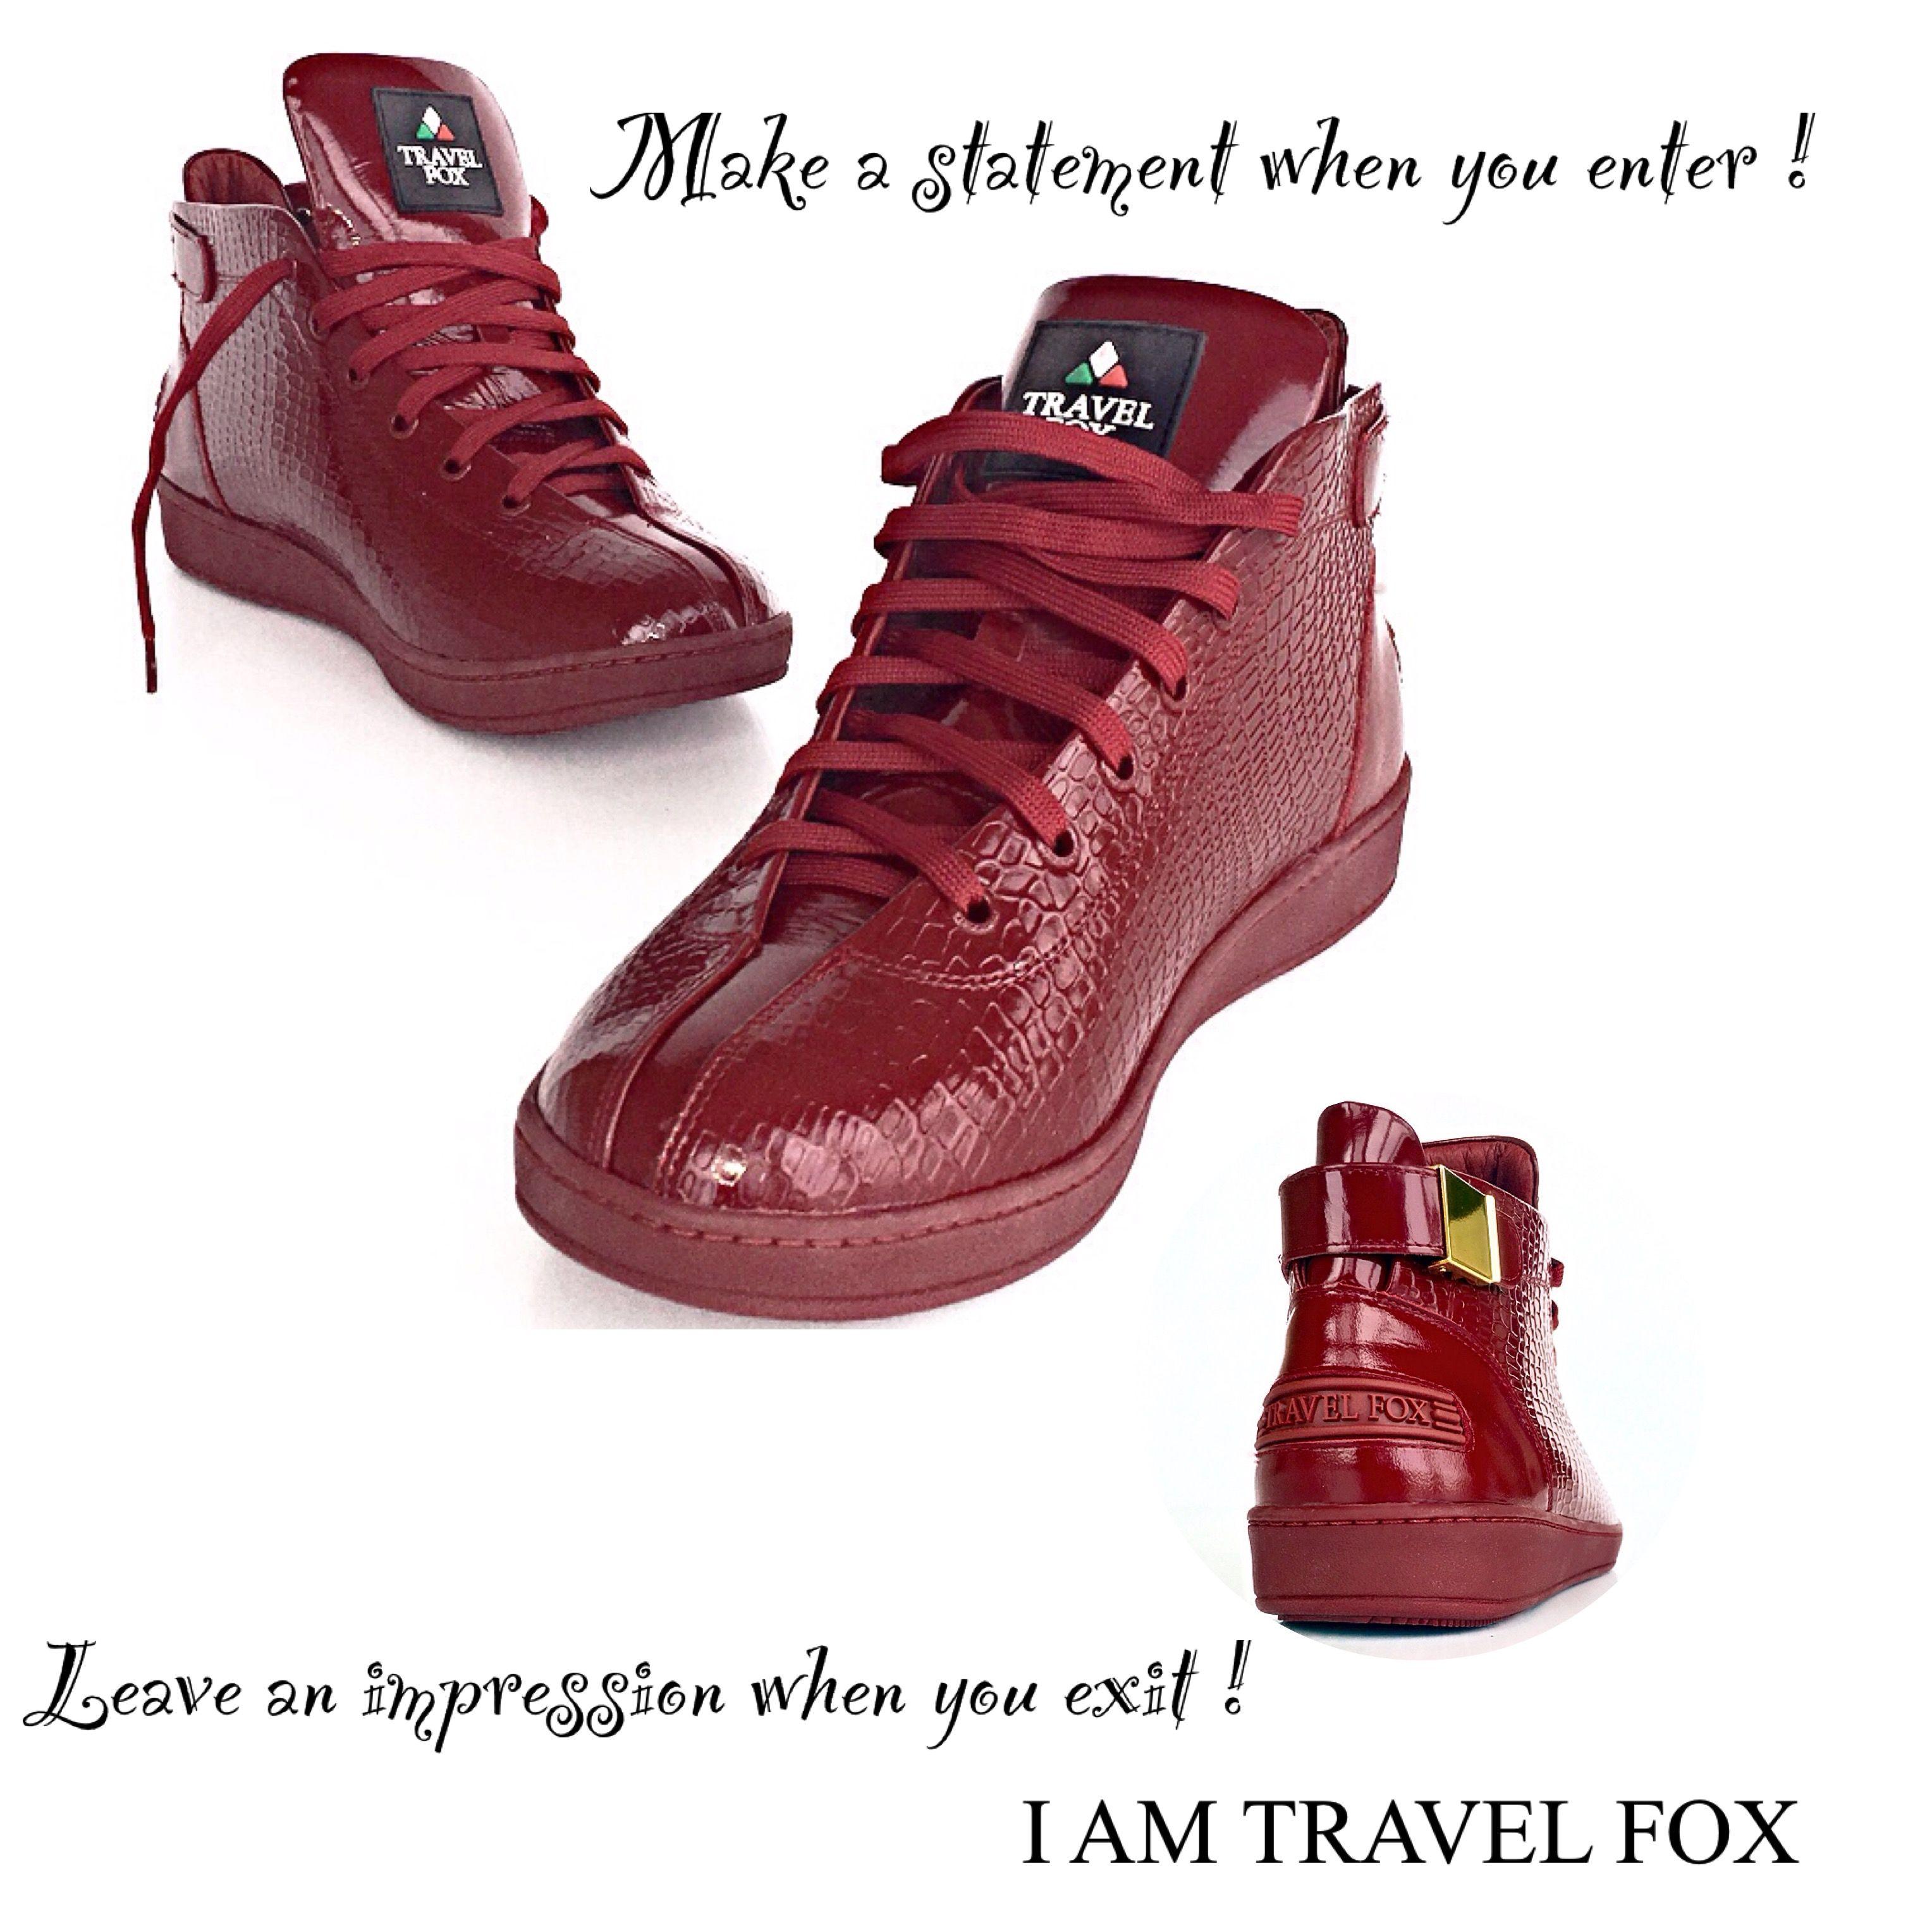 144f1be5da Travel Fox Burgundy Patent Leather Embossed Snake print Malibu 300 s.  What s On Your Feet   travelfox  iamtravelfox  fly  astepbeyondsneaker   ...